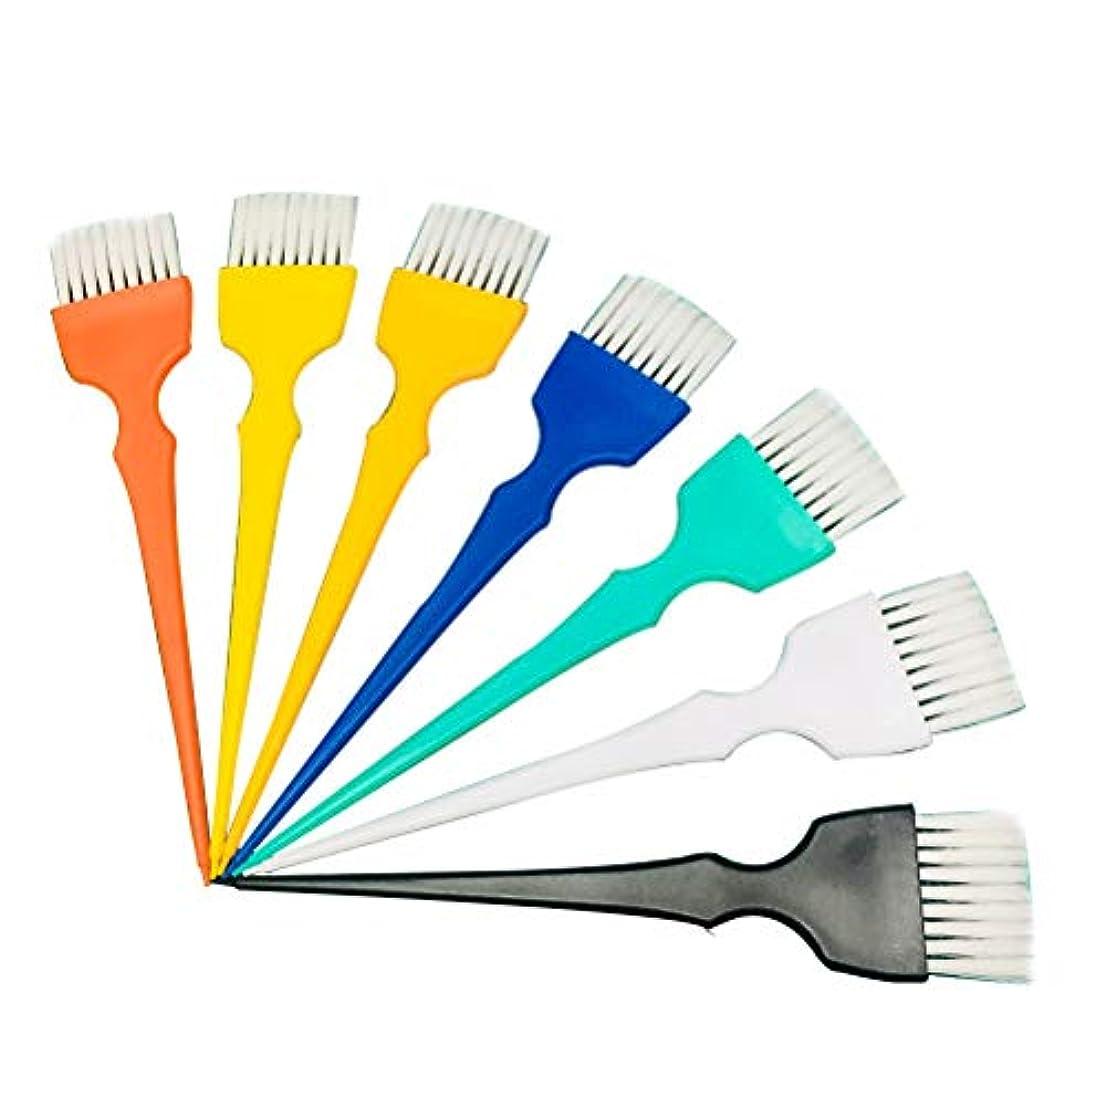 Frcolor ヘアダイブラシ ヘアカラーブラシ ヘアダイコーム 白髪染め 家庭用 美容師プロ用 プラスチック製 7本セット(ランダムカラー)